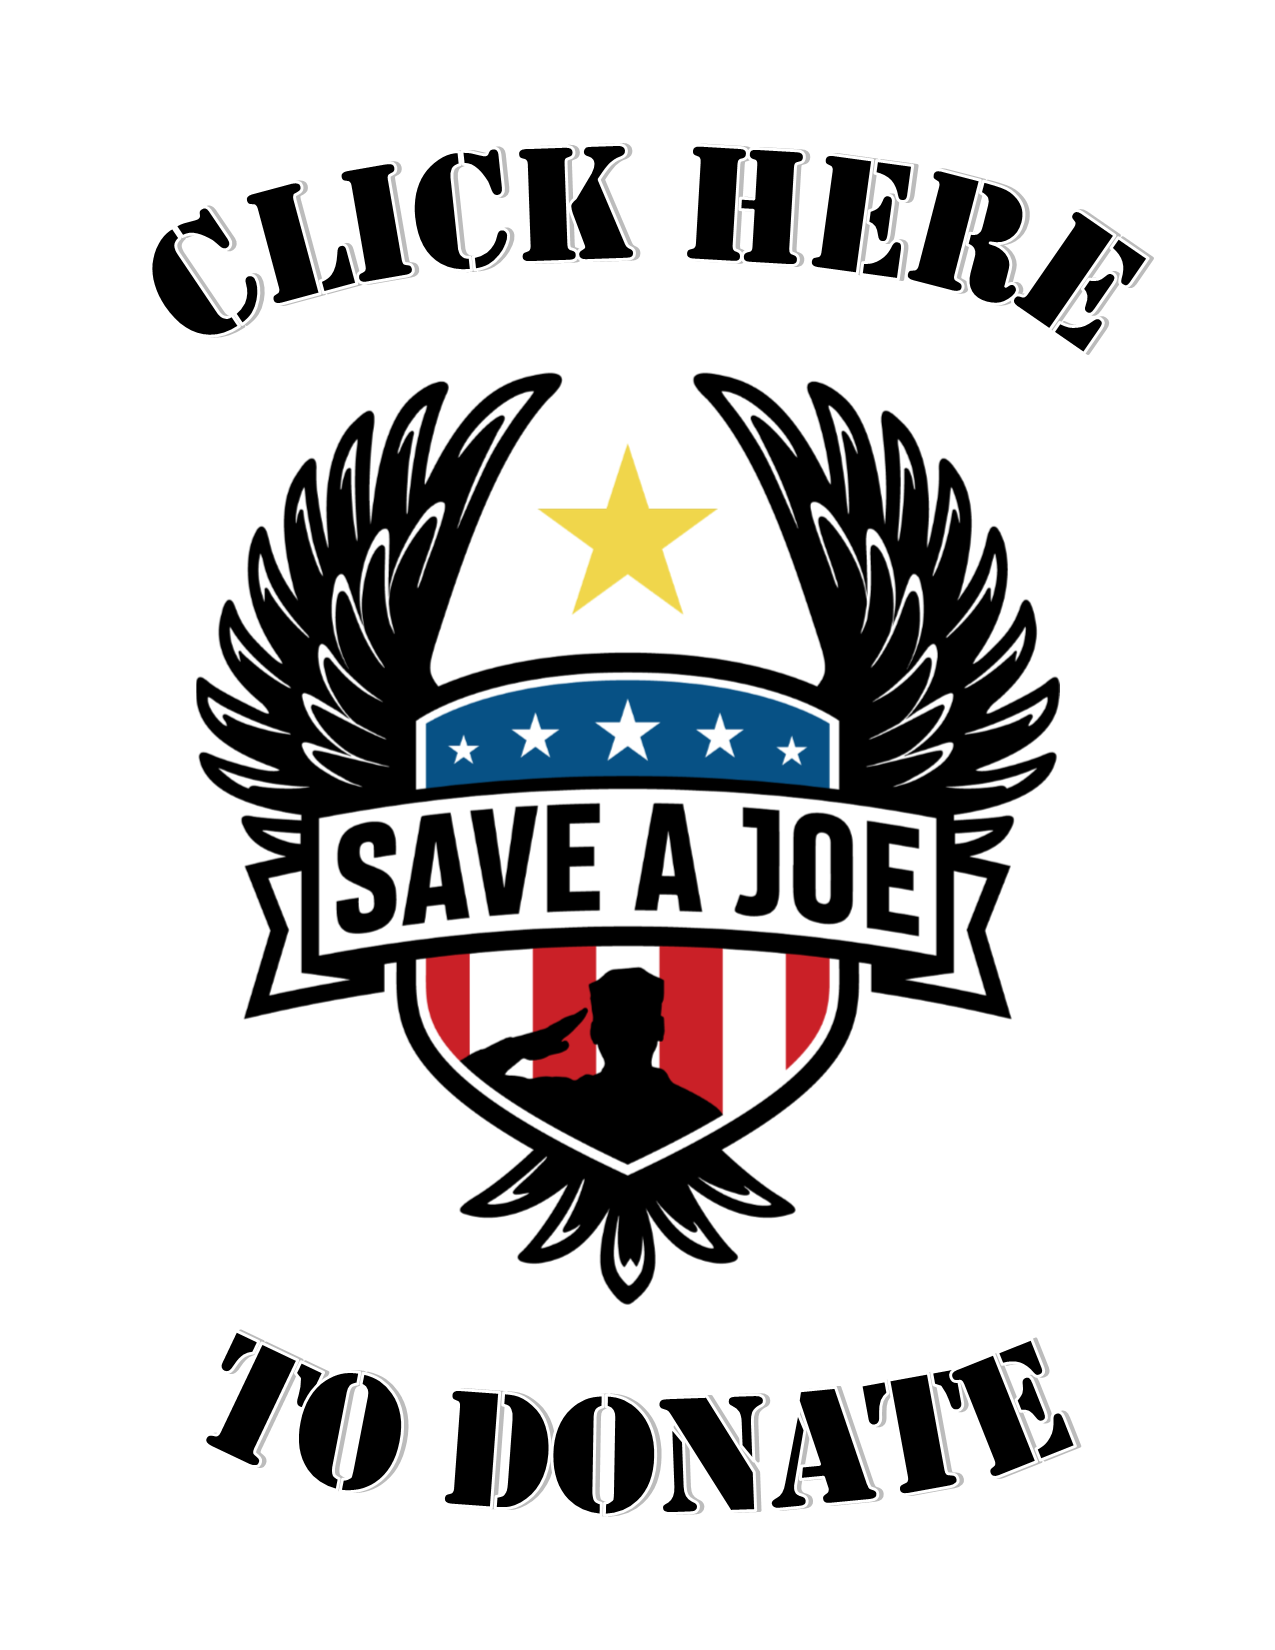 SAJ Donate Image